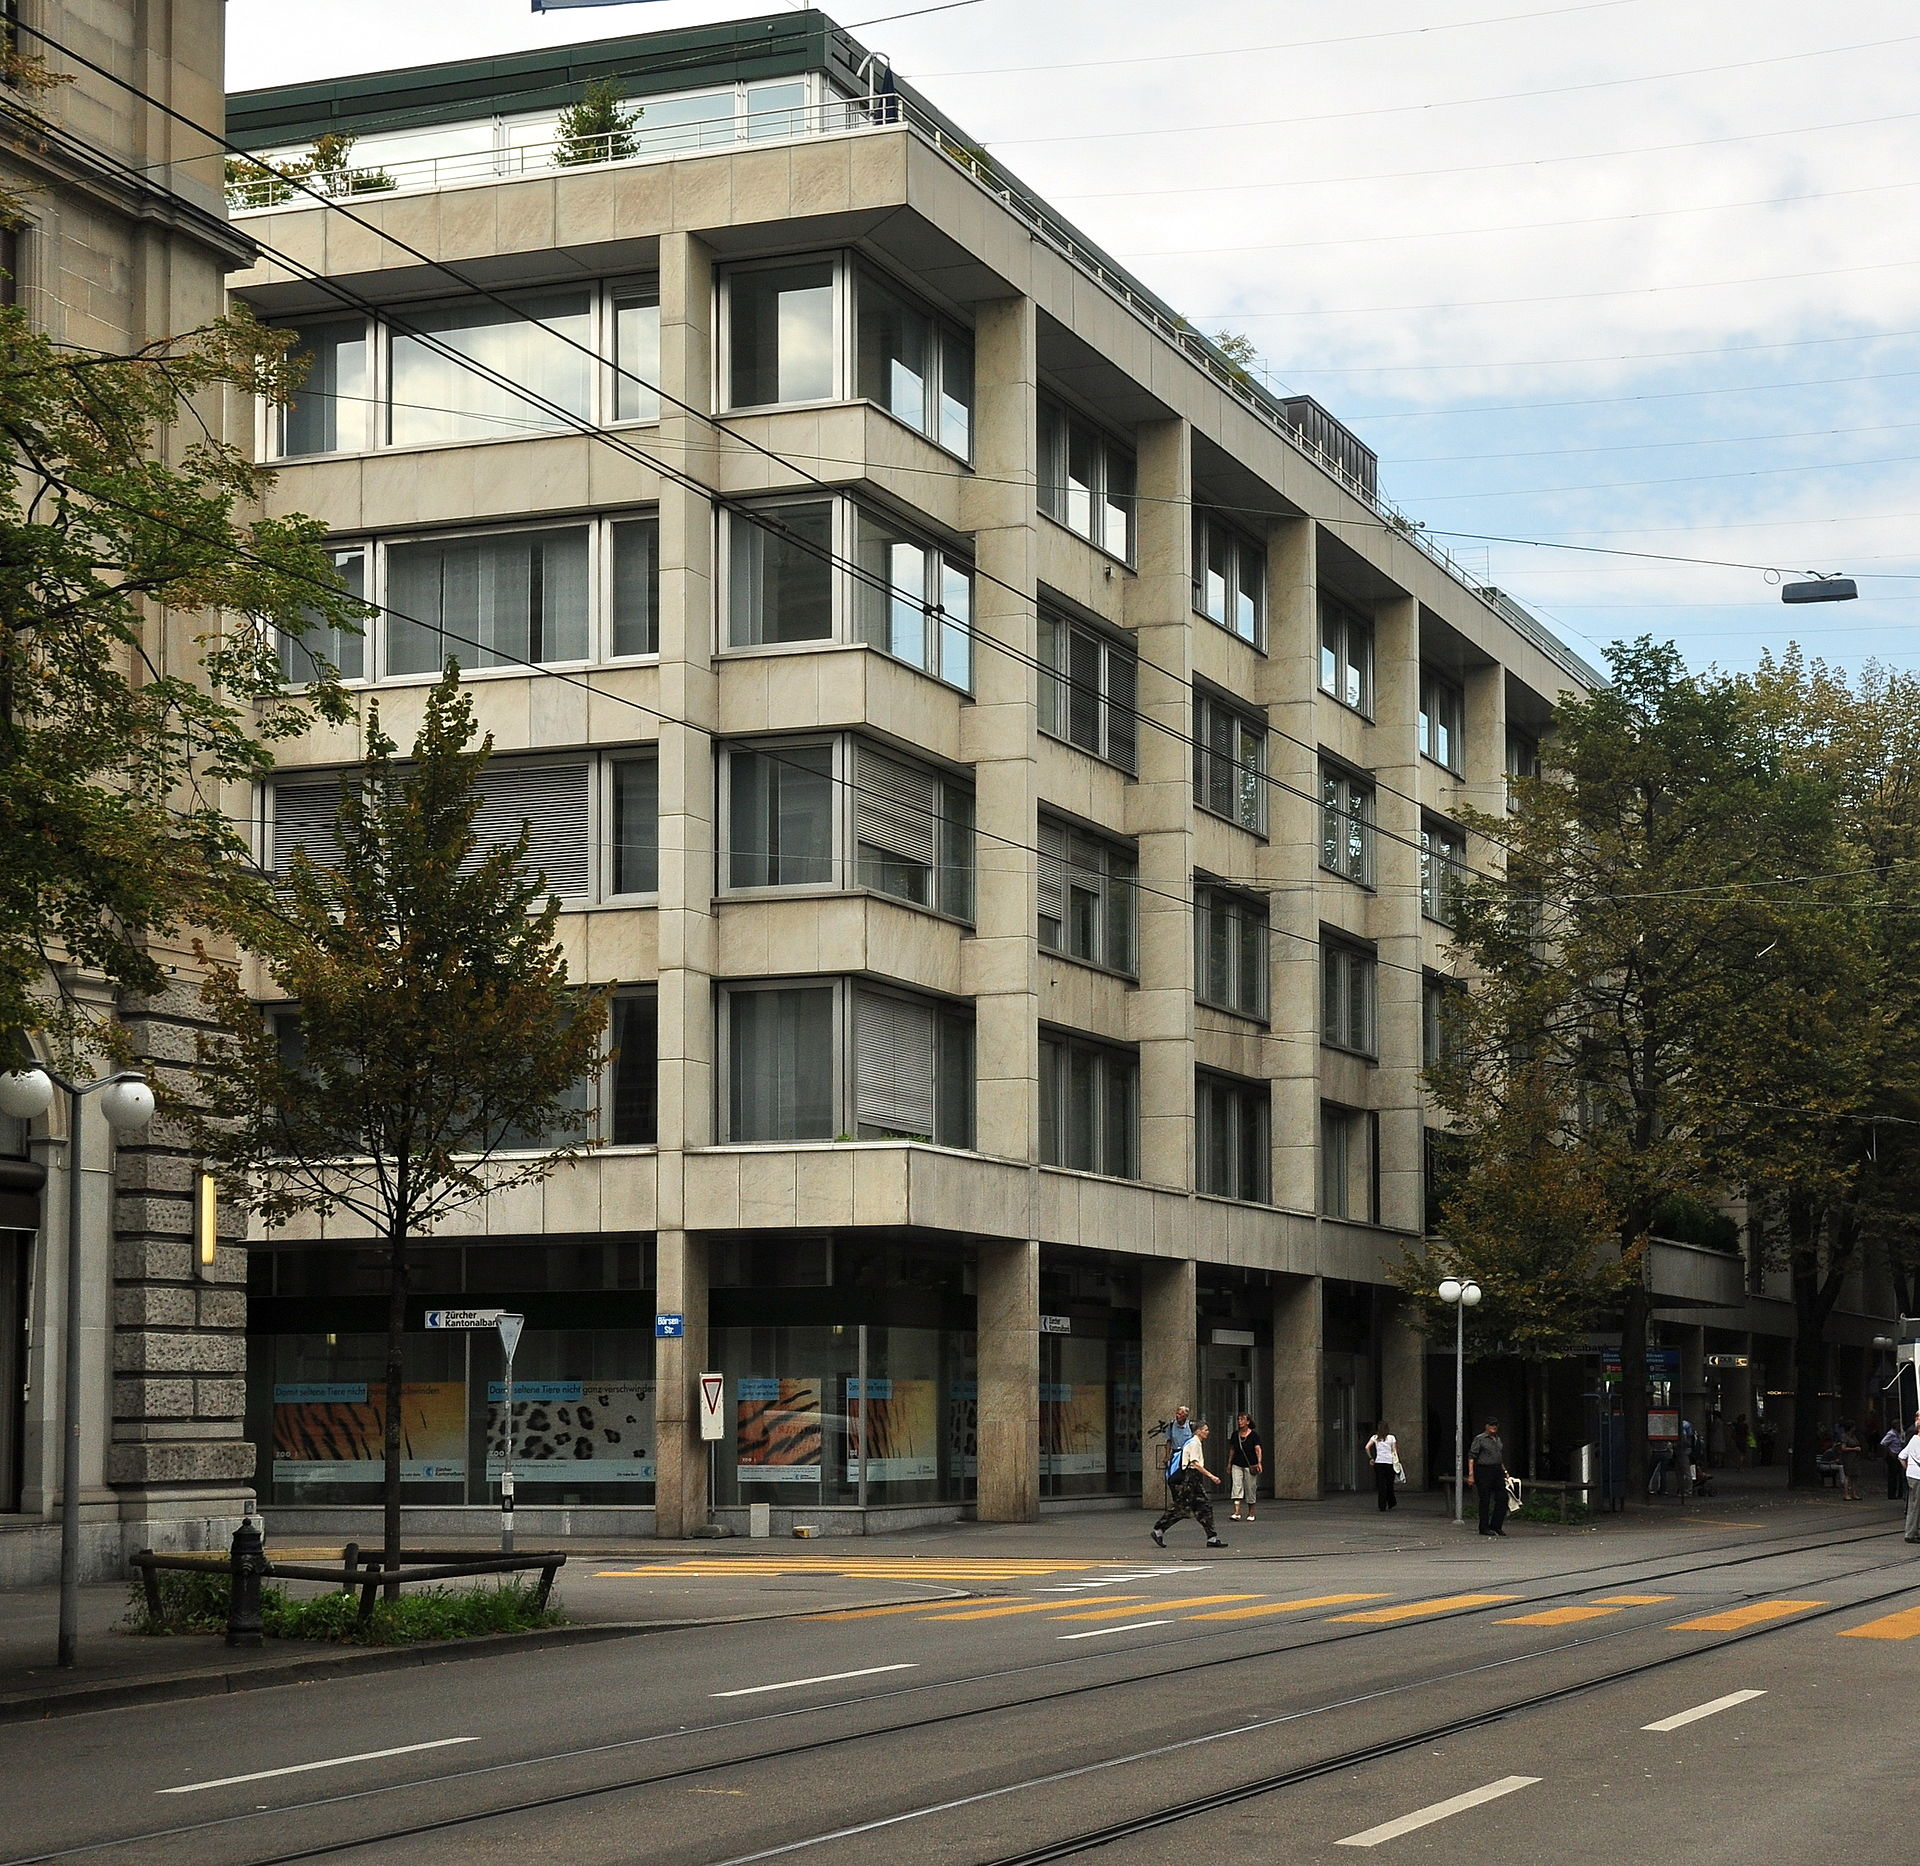 z u00fcrcher kantonalbank  u2013 wikipedia